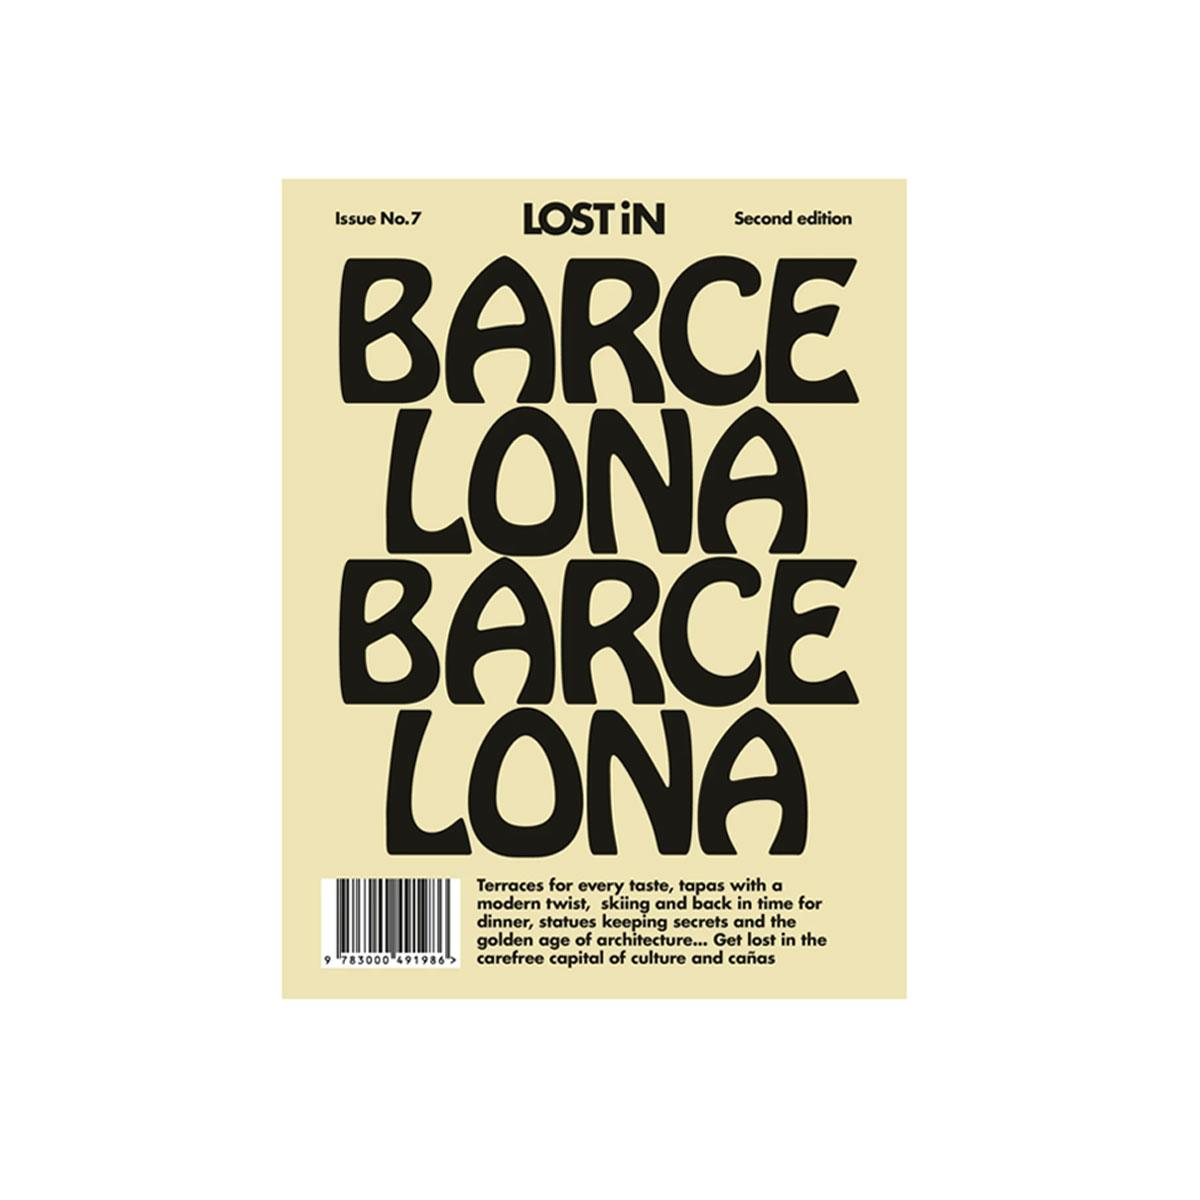 LOST IN City BARCELONA